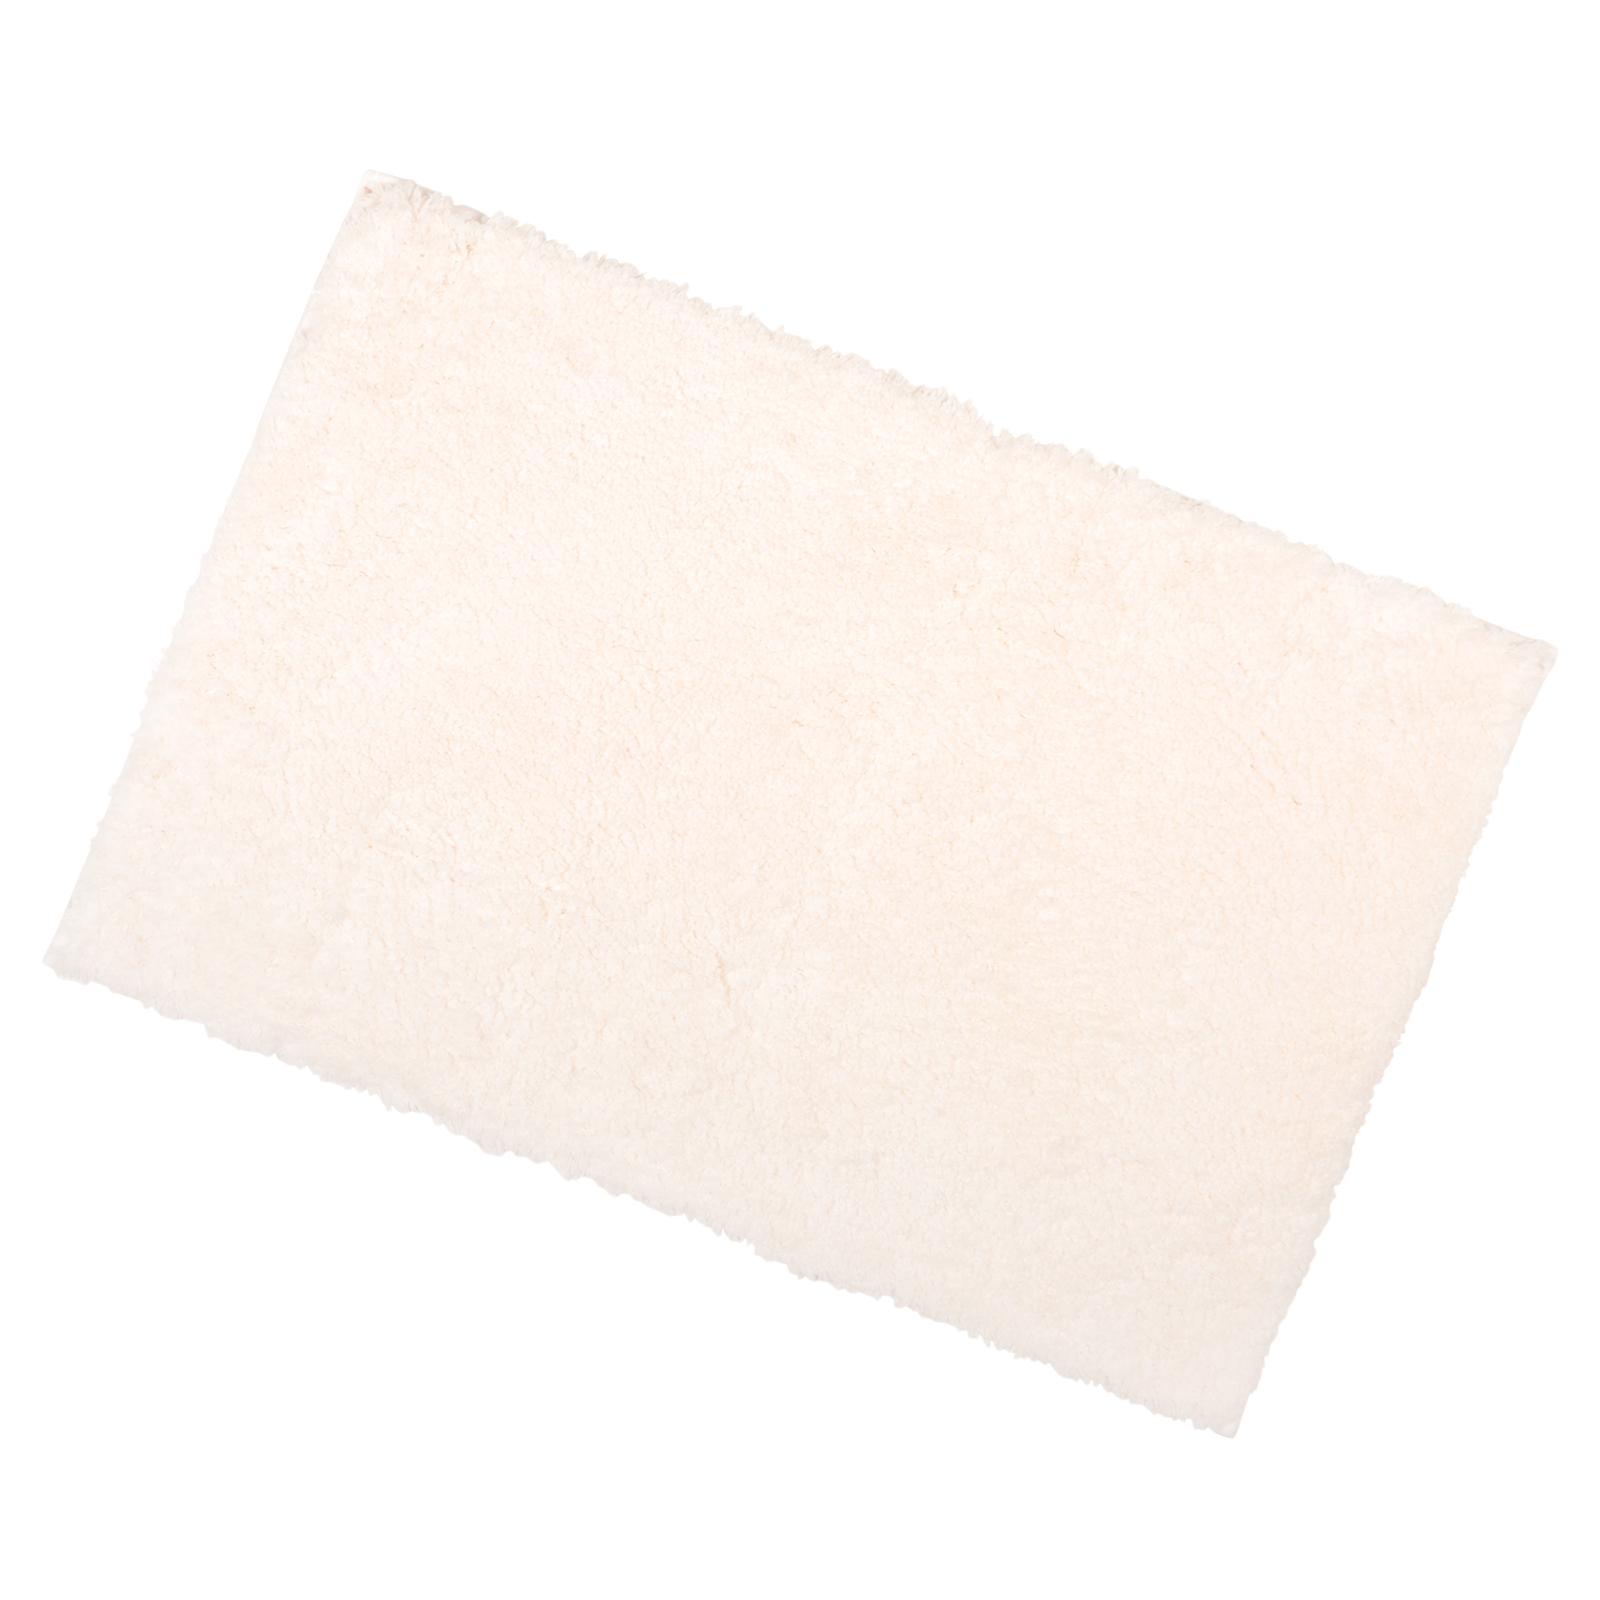 40x60cm ivory tufted microfibre shower bath mat rug non slip backing bamboobliss. Black Bedroom Furniture Sets. Home Design Ideas